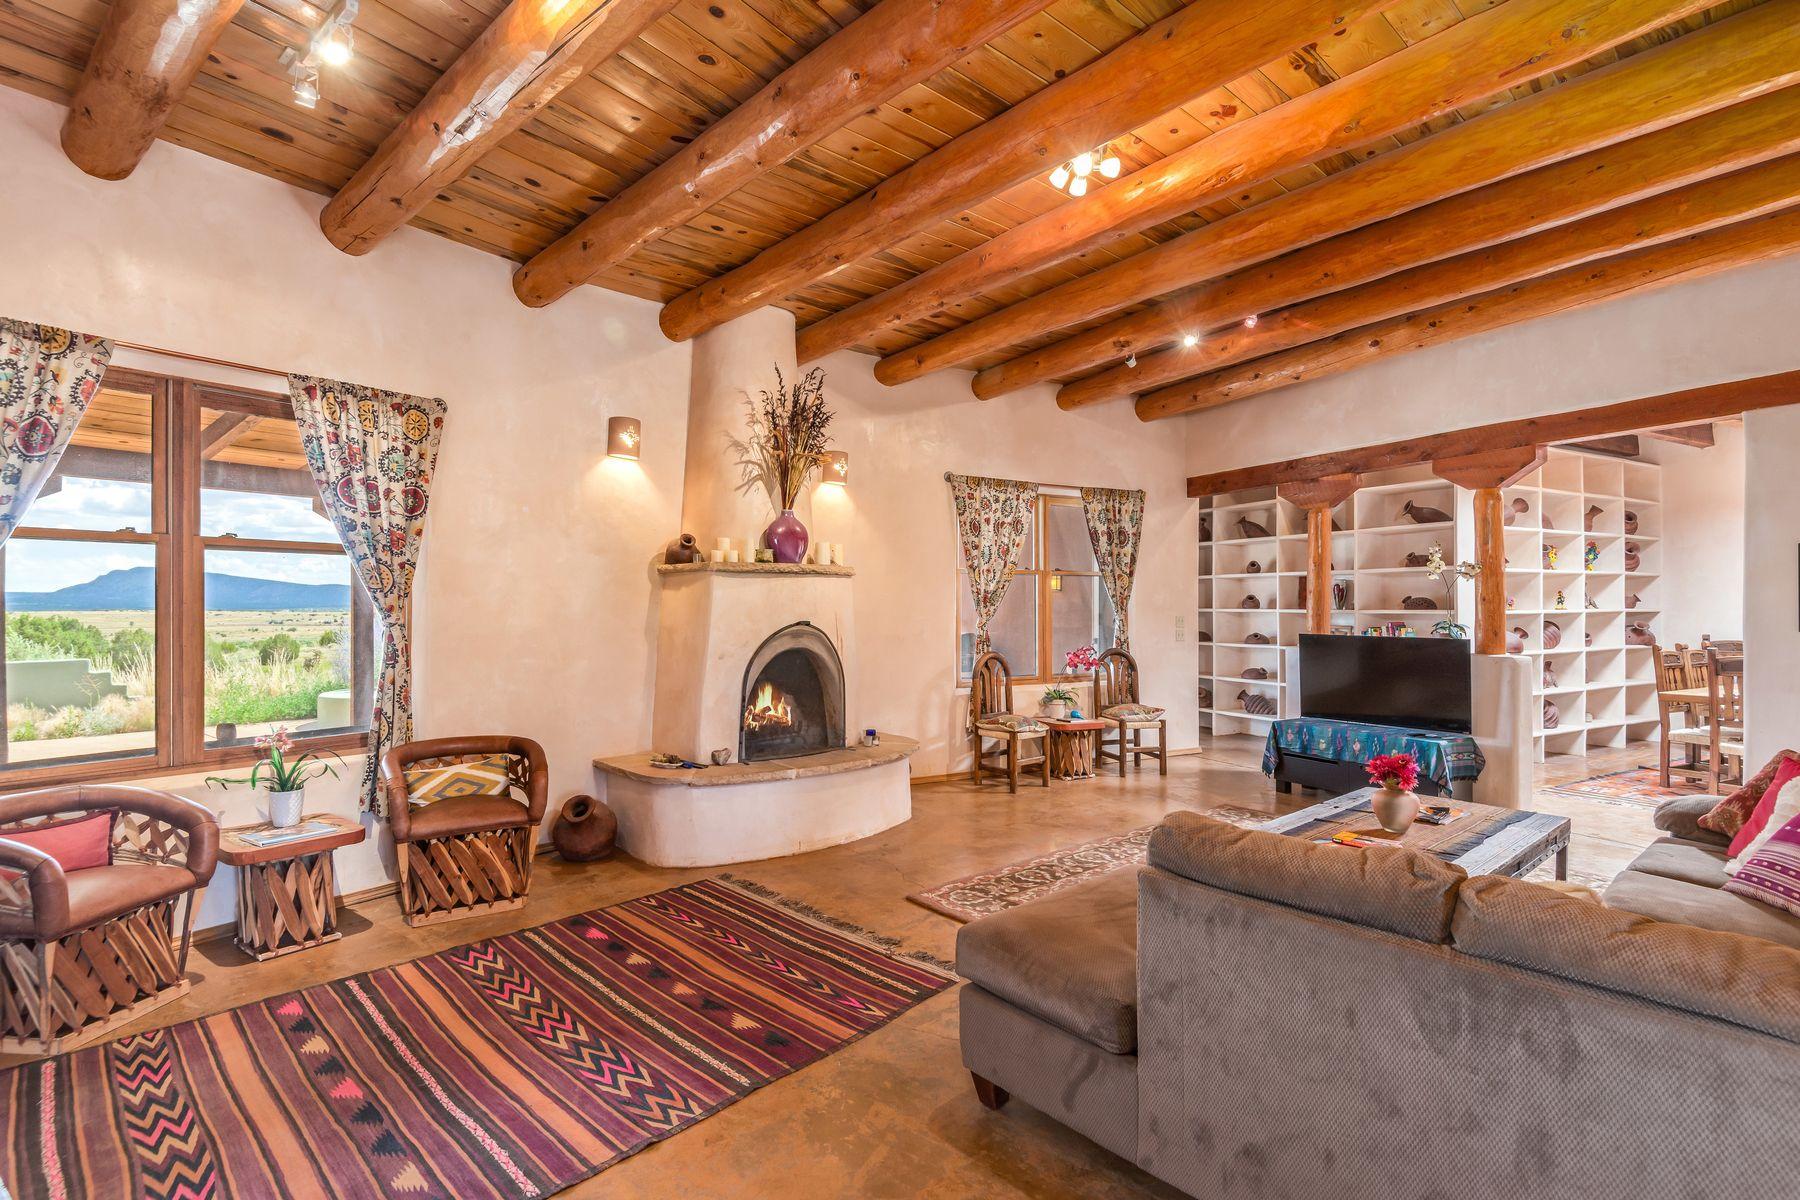 Single Family Homes pour l Vente à 784-A Camino Los Abuelos 784a Camino Los Abuelos, Galisteo, Nouveau-Mexique 87540 États-Unis